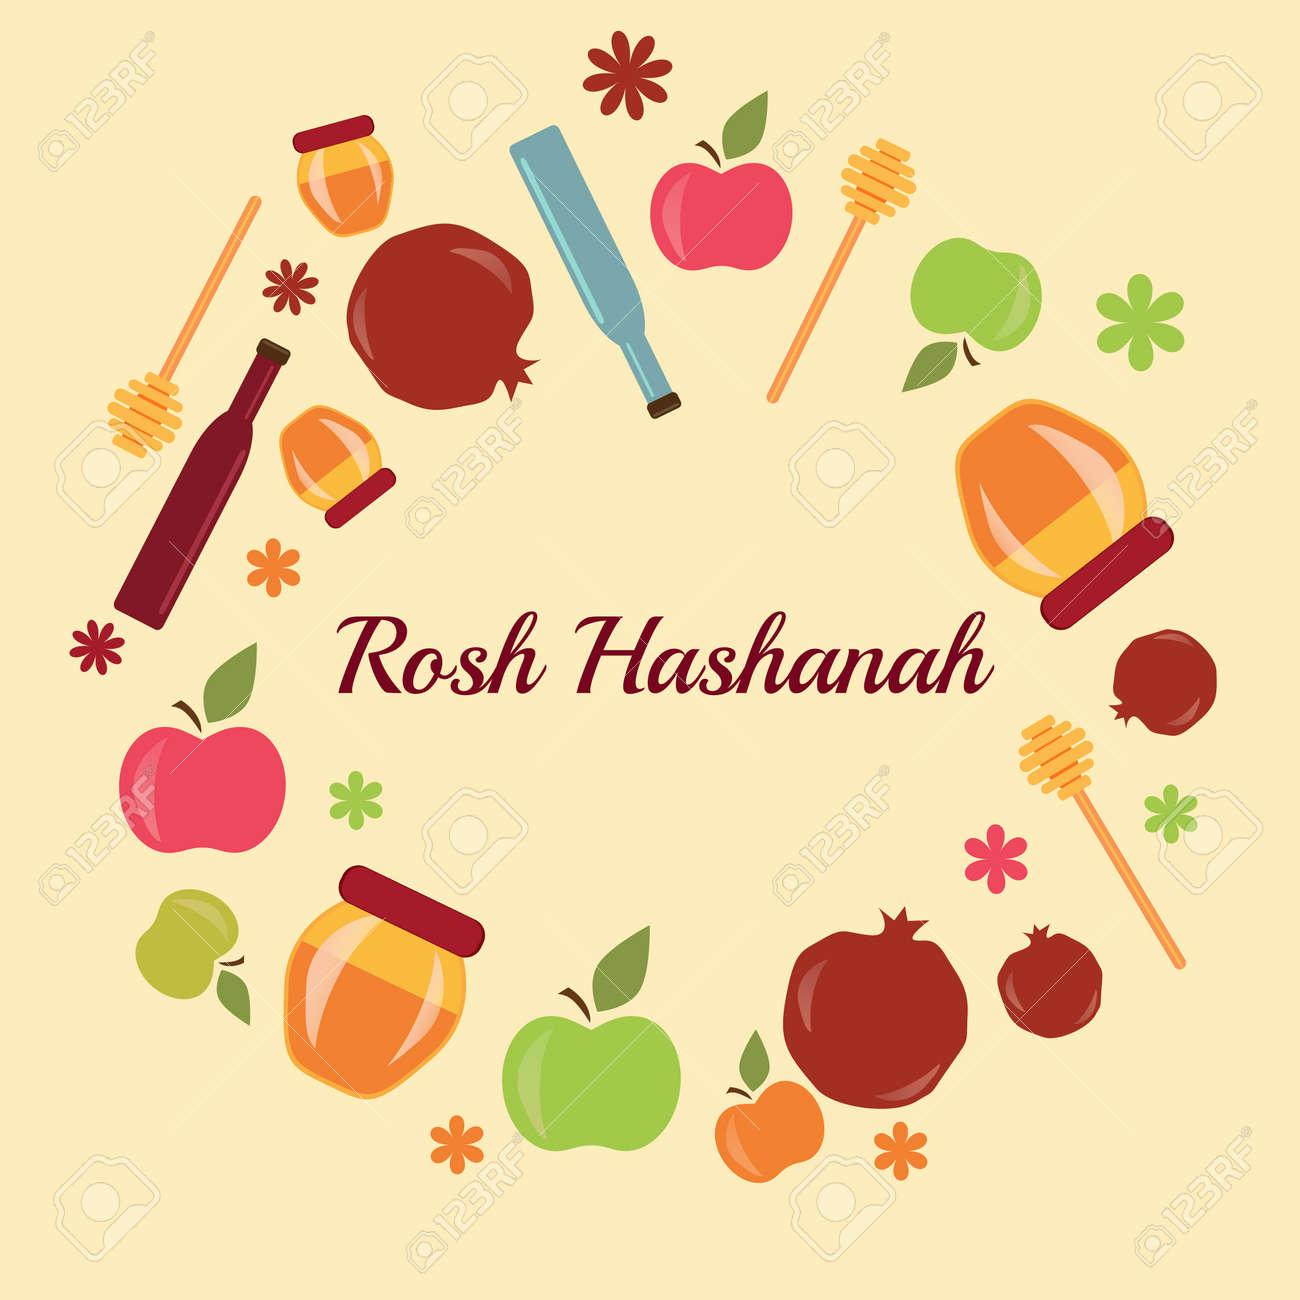 Greeting Card Design For Jewish New Year Rosh Hashanah Vector